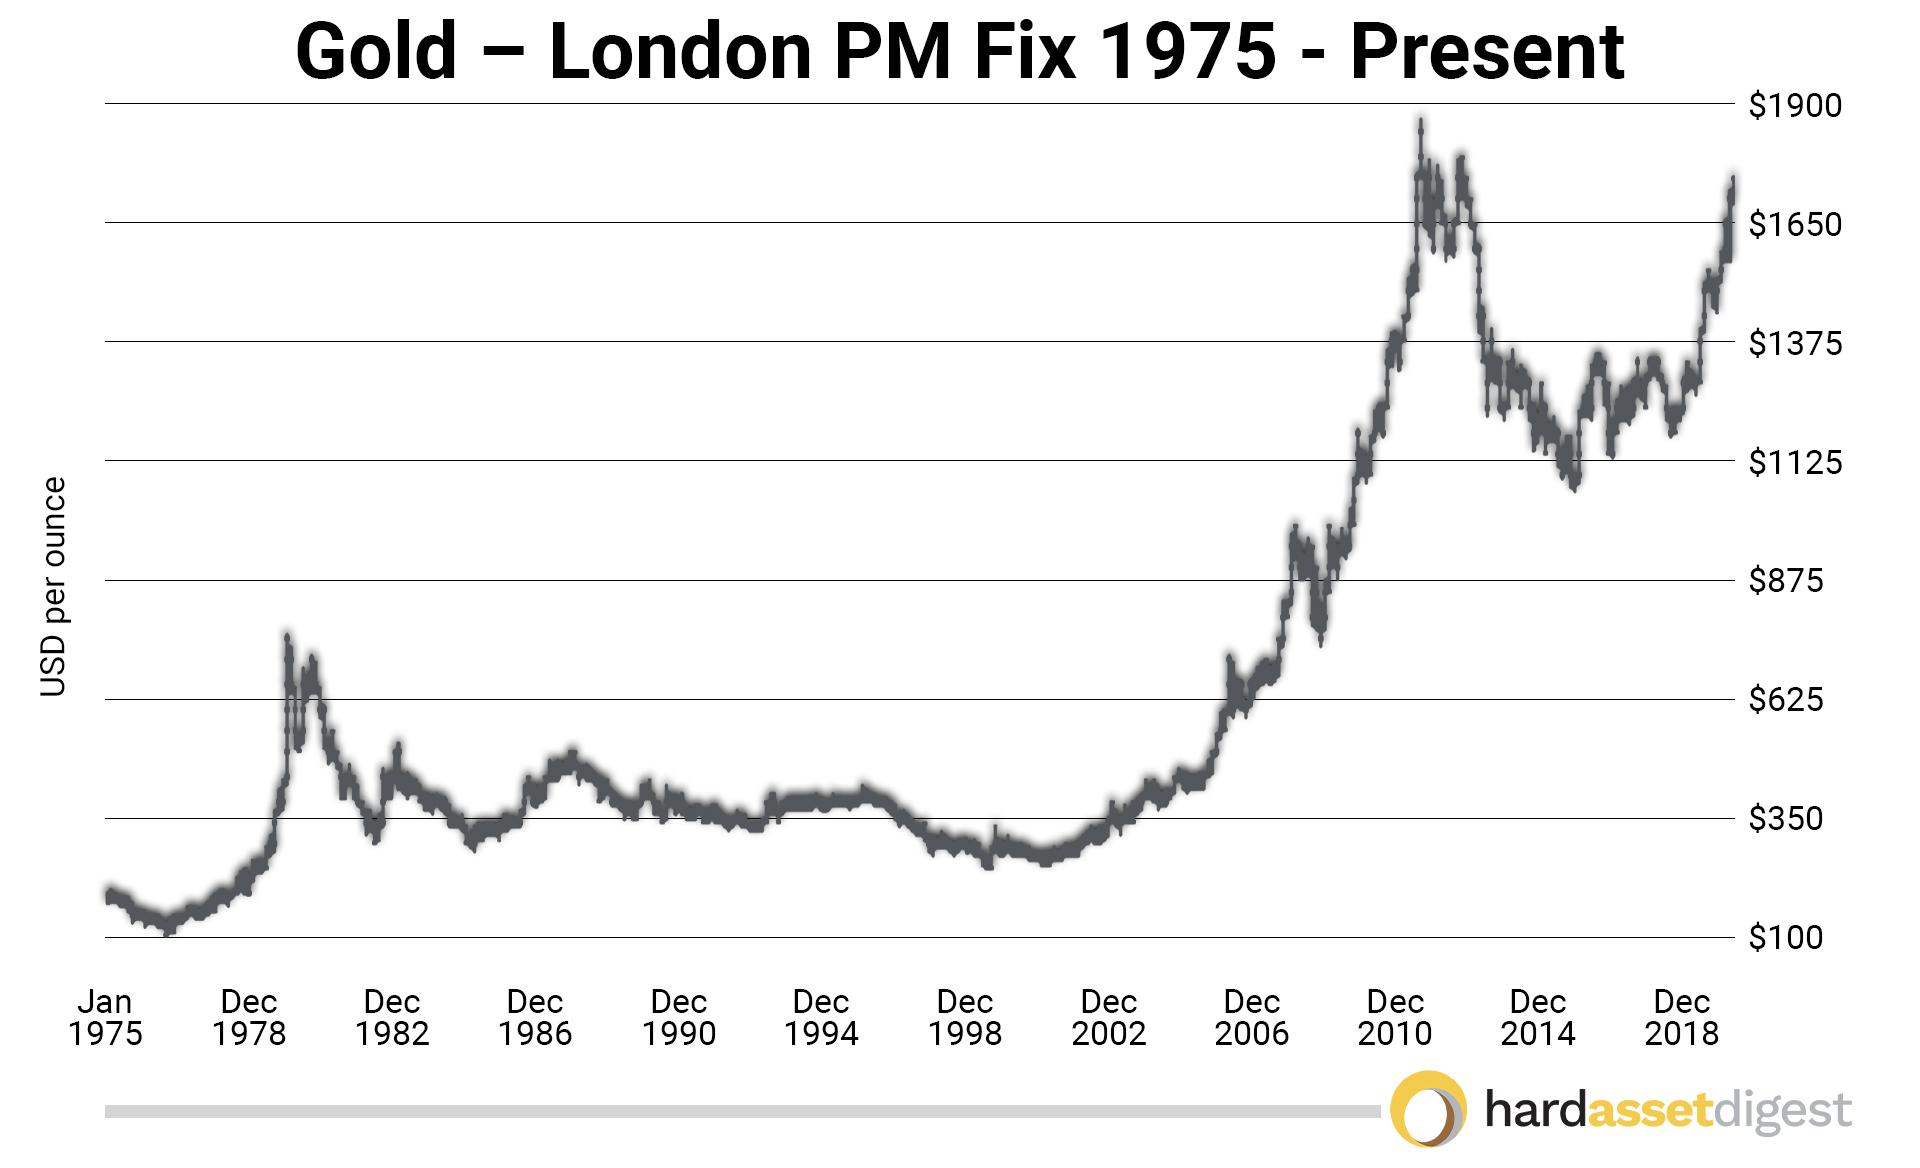 gold-london-pm-fix-1975-present